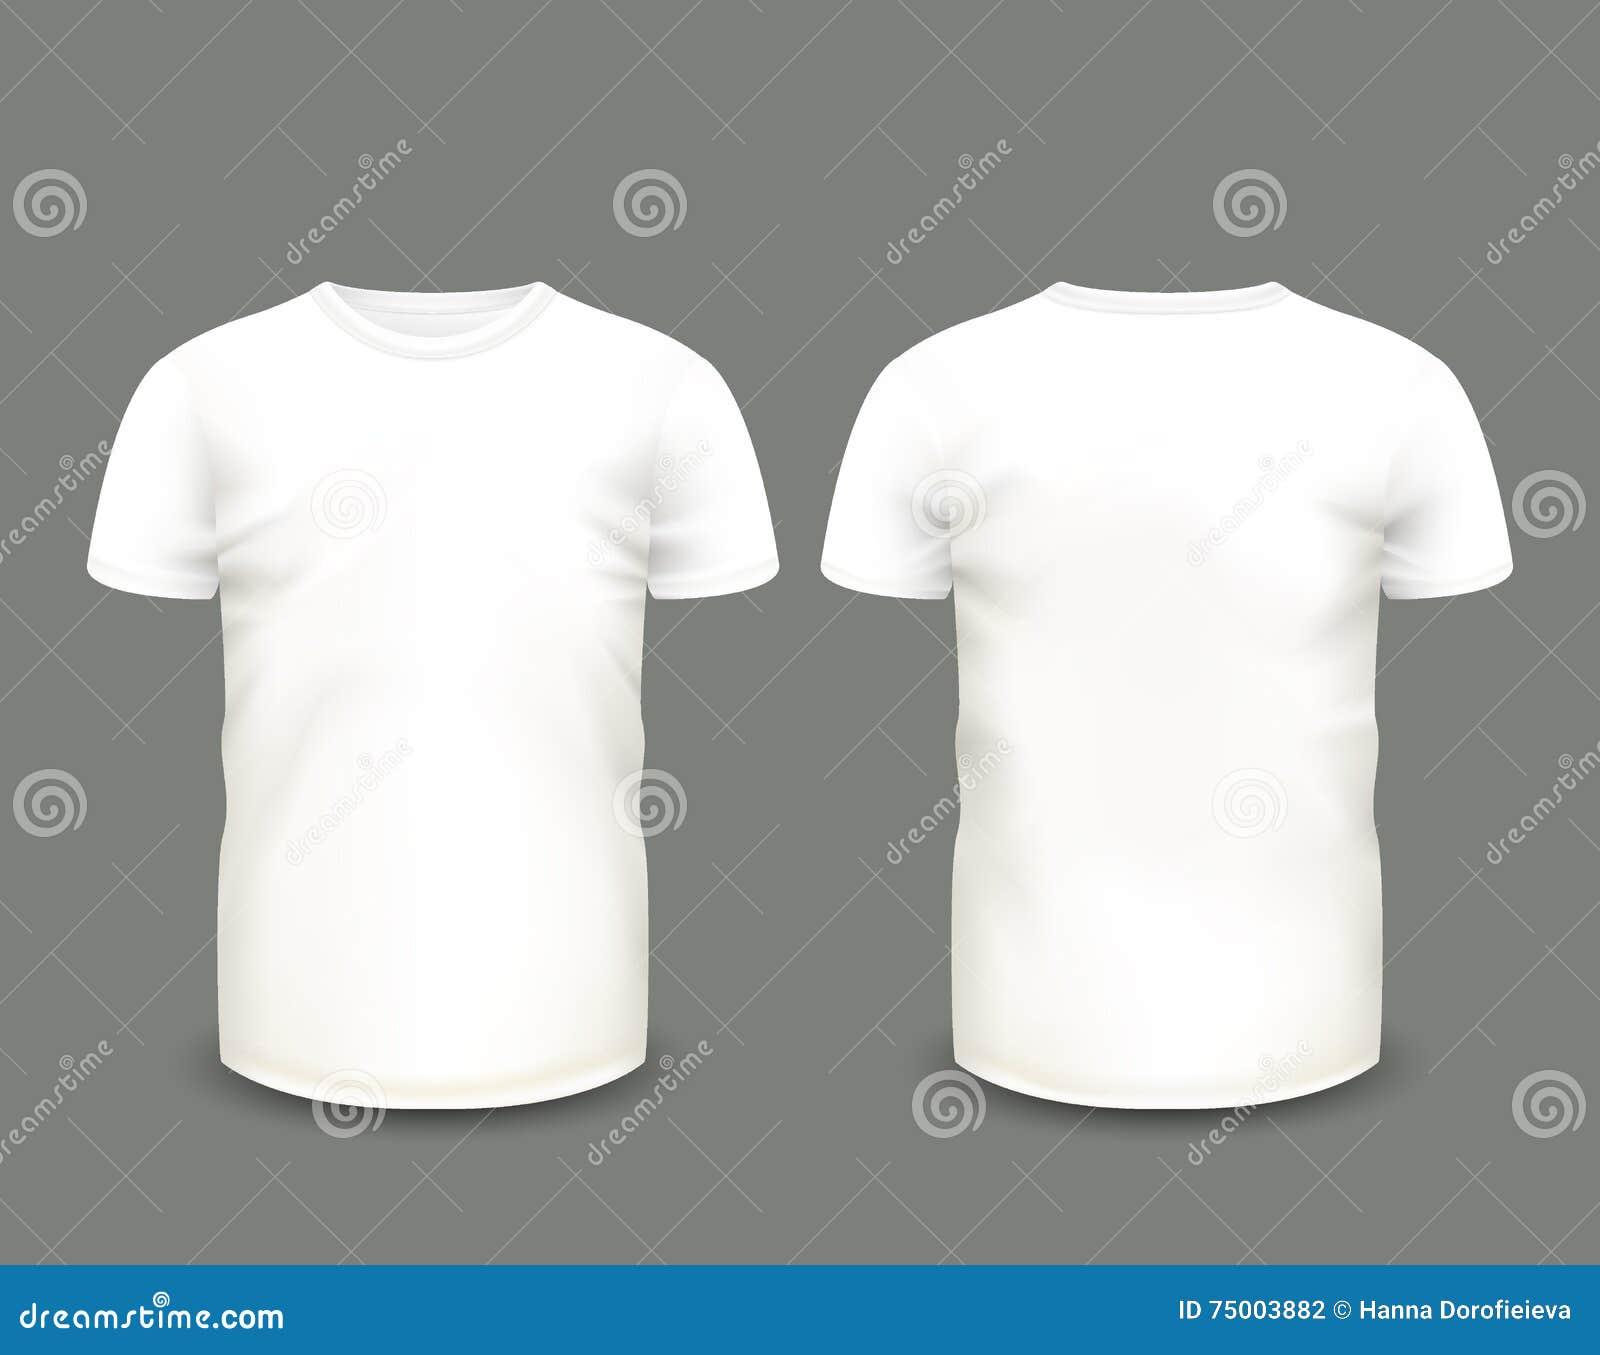 Tshirt putih 3 - 3 part 10